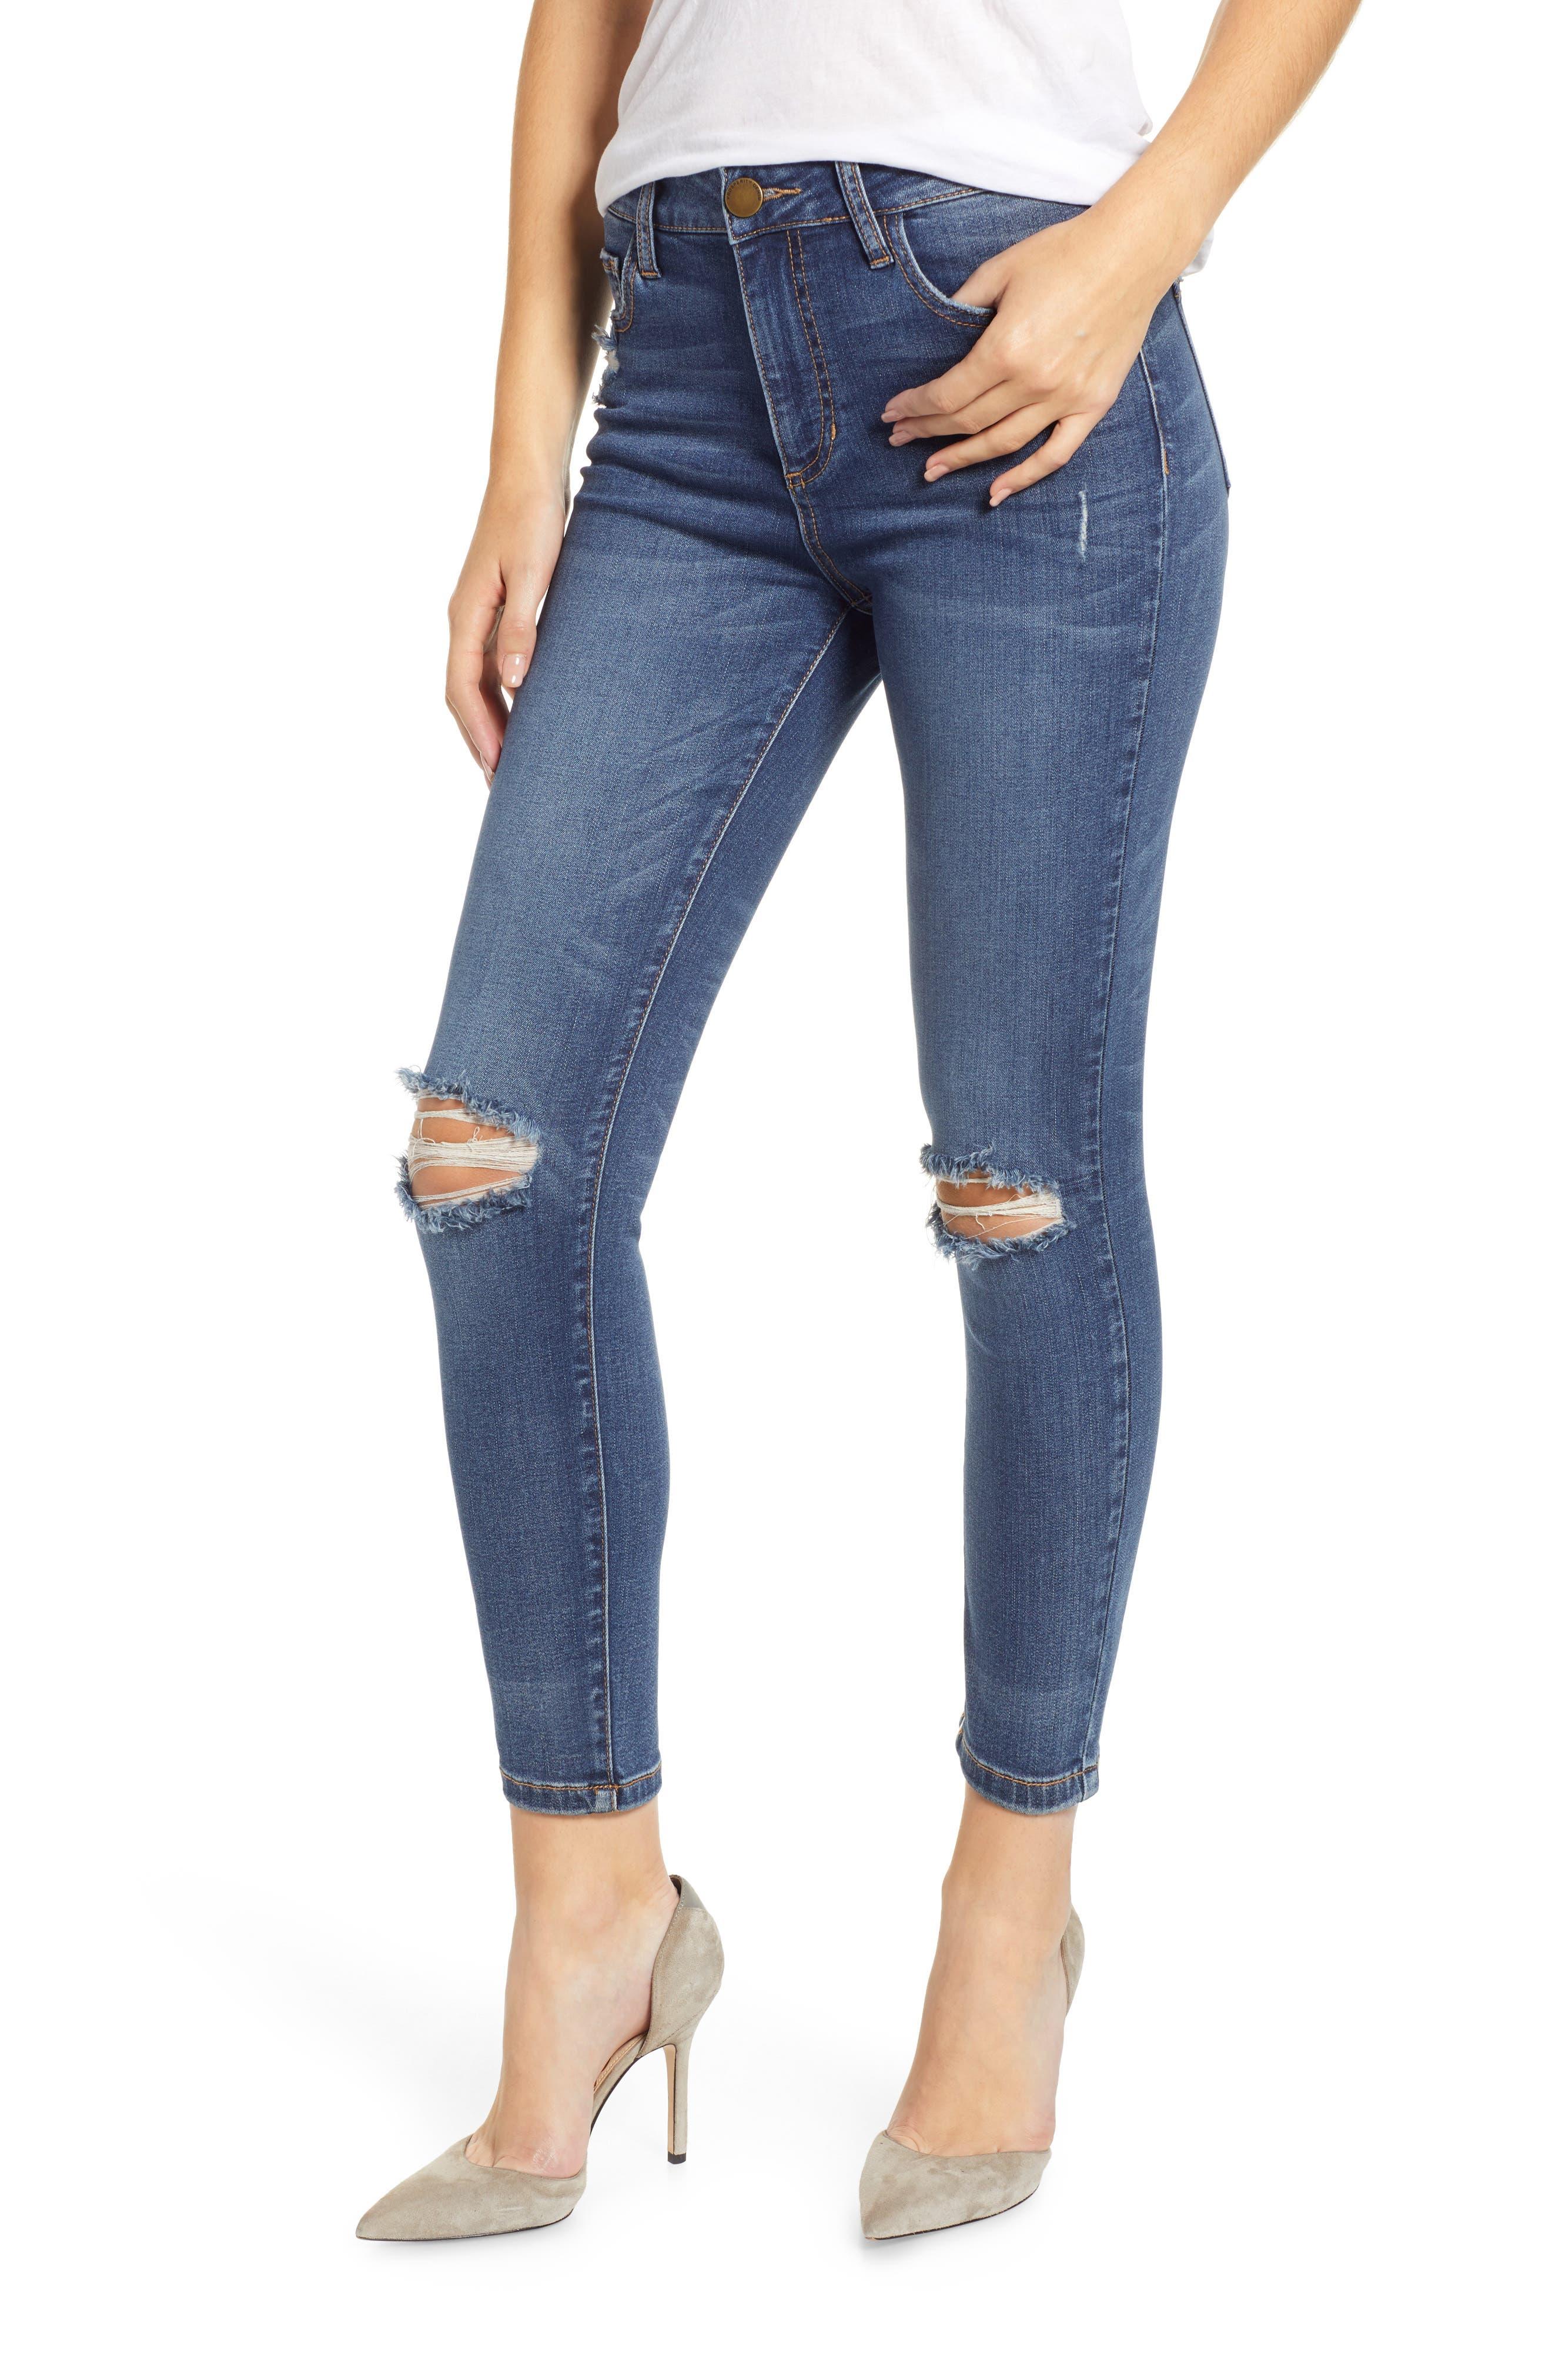 PROSPERITY DENIM Ripped High Waist Skinny Jeans, Main, color, RAYA WASH